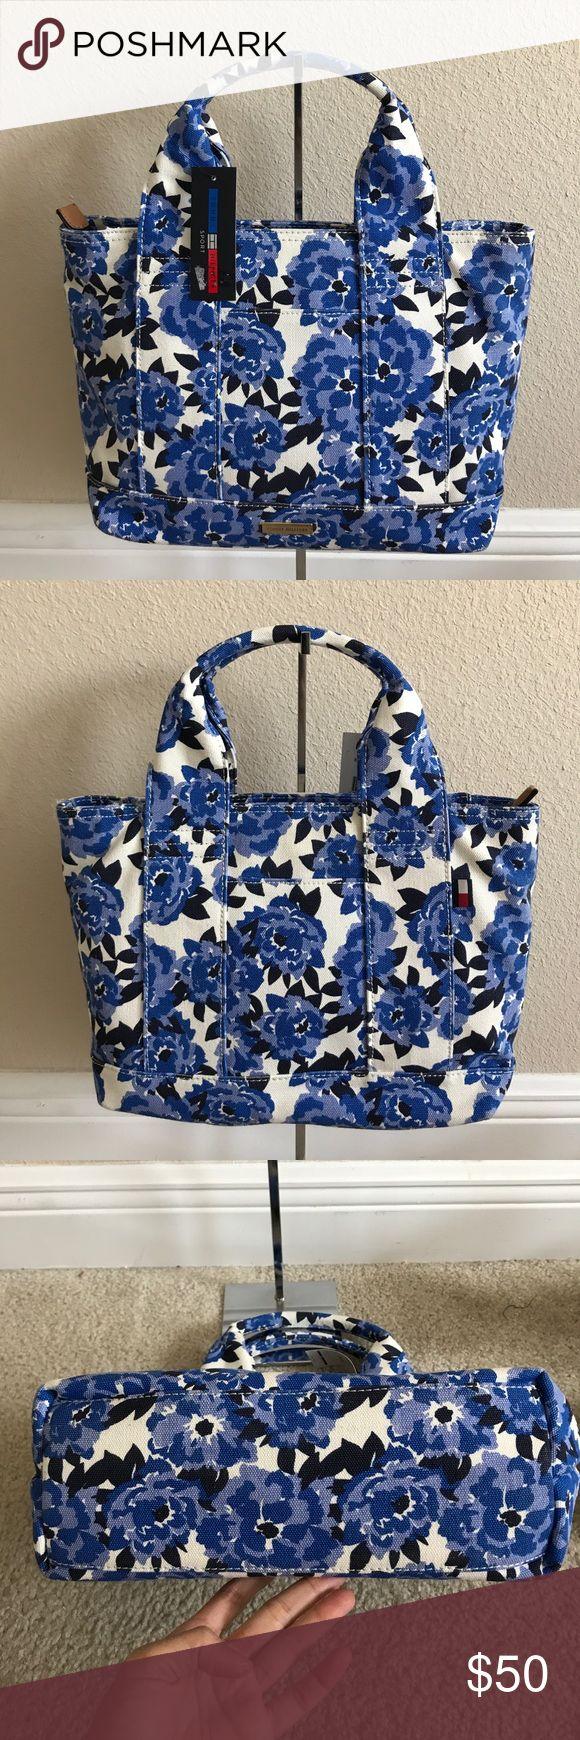 "Tommy Hilfiger shopper handbag Brand new with tag .w 12x L 9 1/2 x d 4"". Tommy Hilfiger Bags"